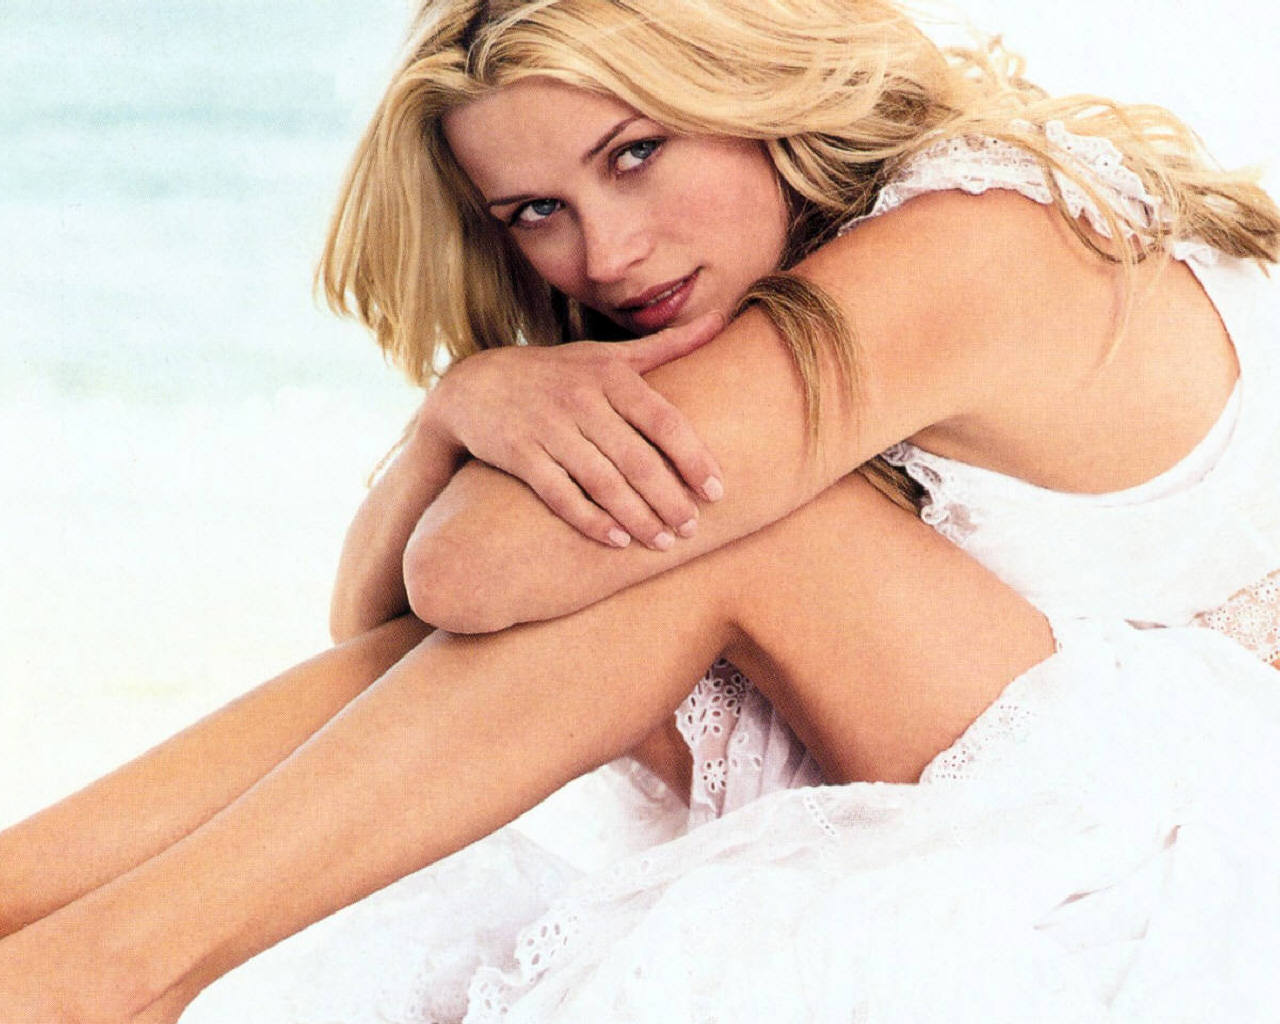 http://3.bp.blogspot.com/-NUJflTJdRU8/T_QYmXwp5pI/AAAAAAAAB5w/25_UzYT2o50/s1600/Reese-Witherspoon-Shirtless.jpg